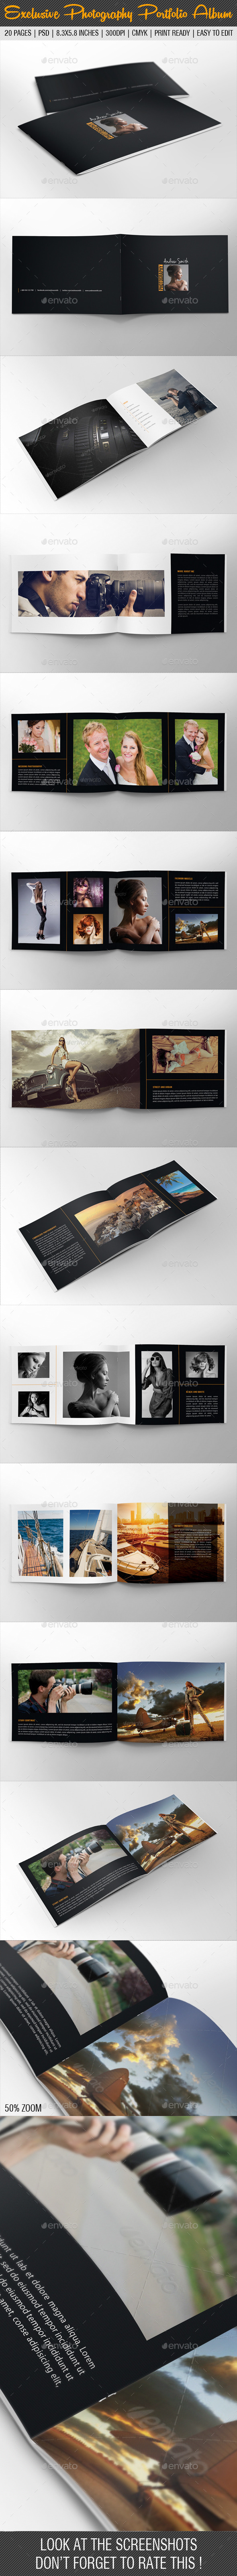 Exclusive Photography Portfolio Album 07 - Photo Albums Print Templates